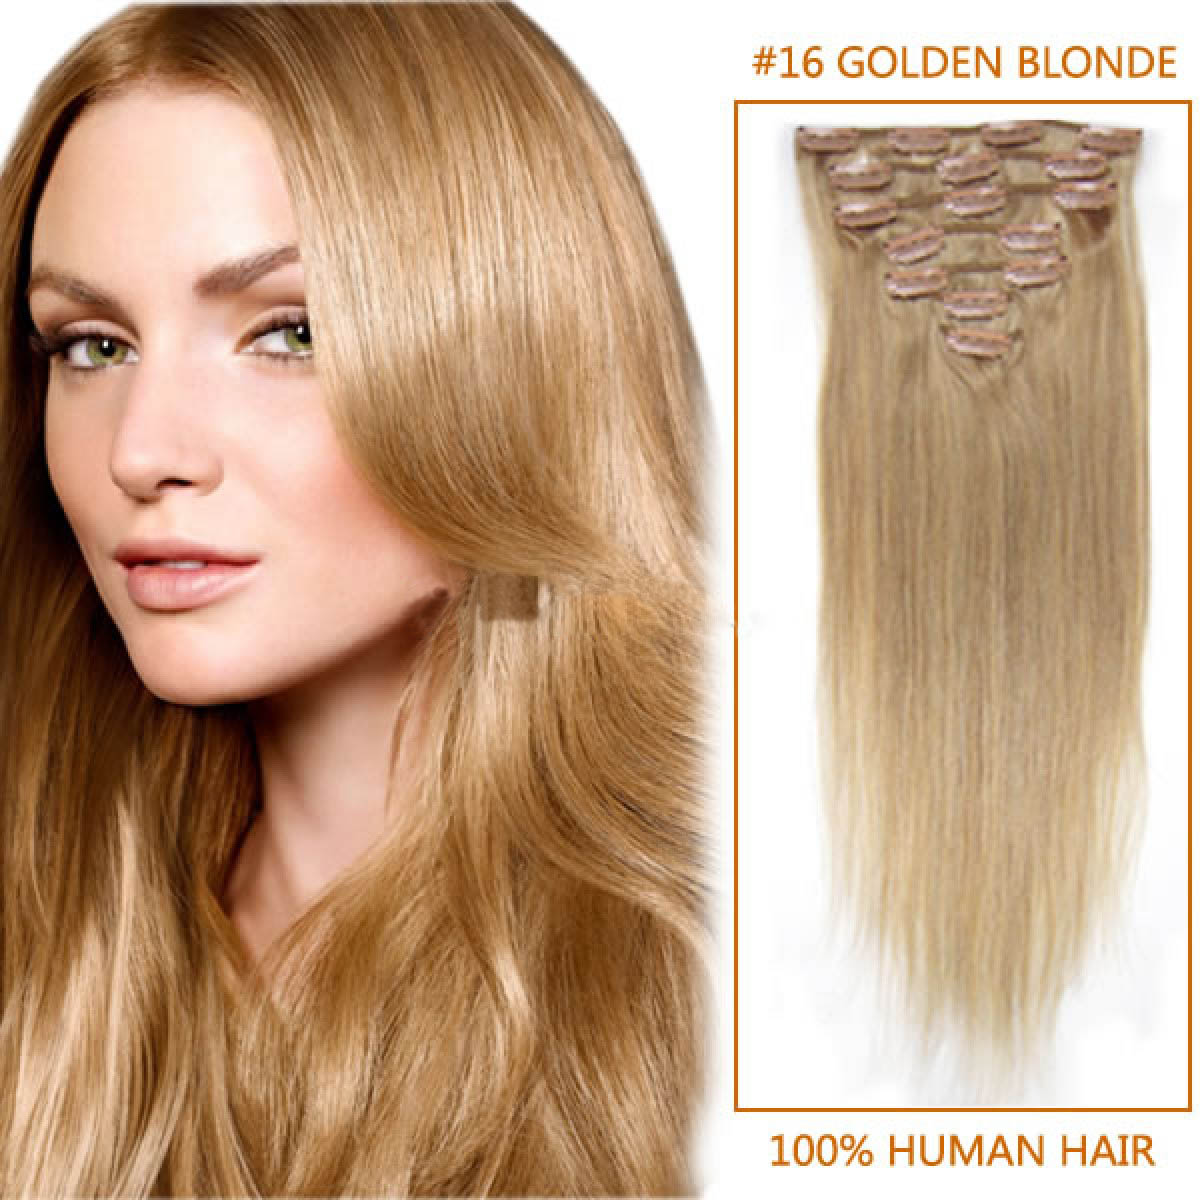 Inch 16 golden blonde clip in human hair extensions 10pcs 20 inch 16 golden blonde clip in human hair extensions 10pcs pmusecretfo Gallery